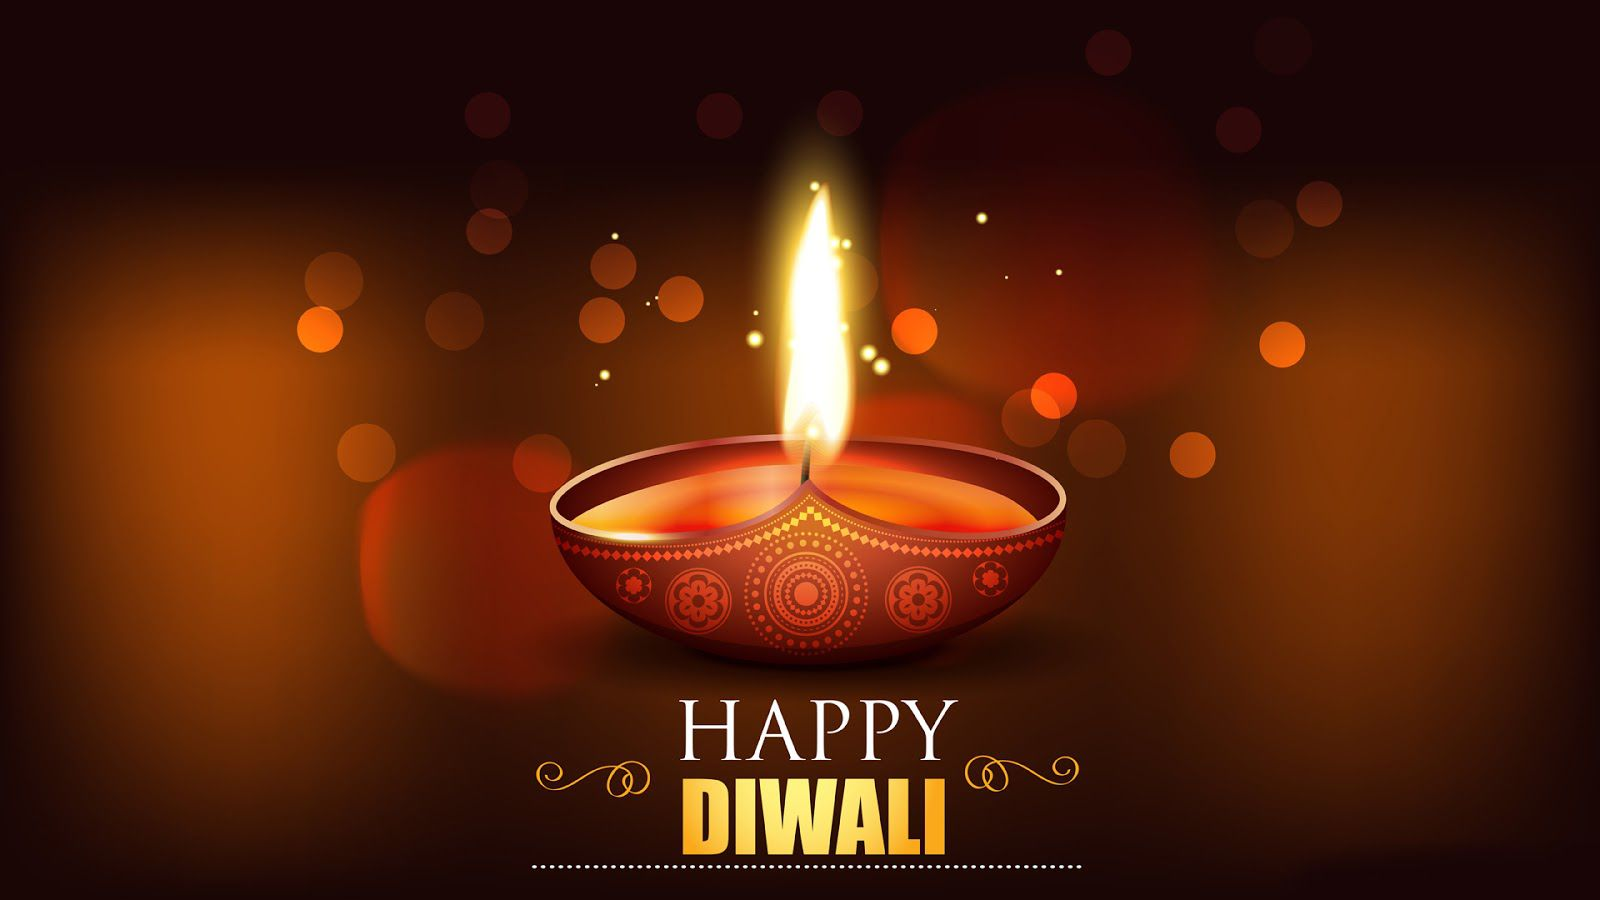 Happy Diwali 2018 Wishes Sms Status Jokes Greetings Diwali